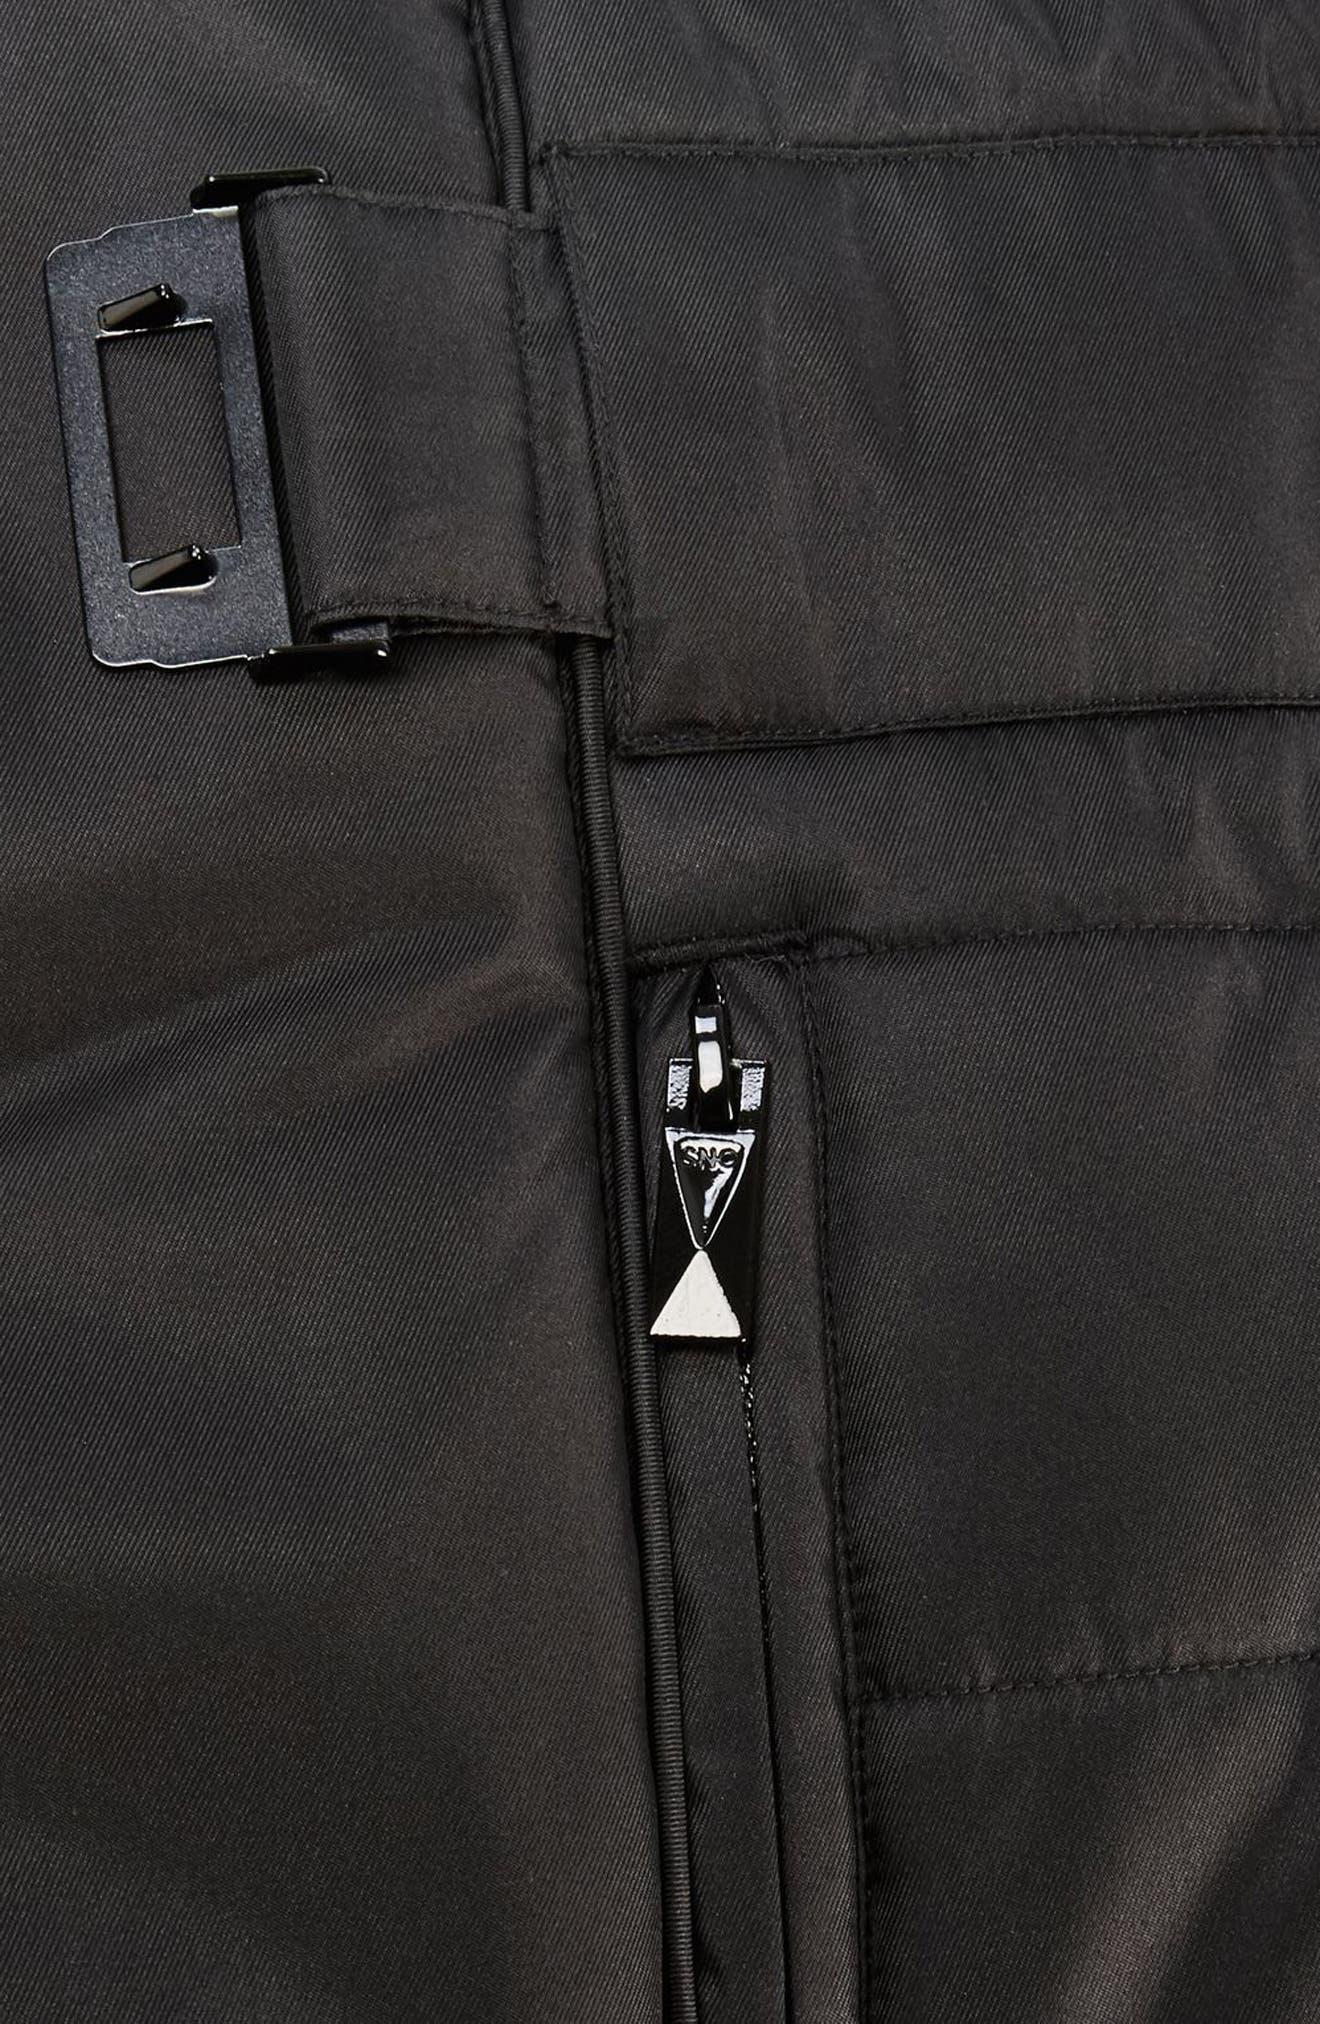 SNO Amazon Puffer Jacket,                             Alternate thumbnail 5, color,                             Black